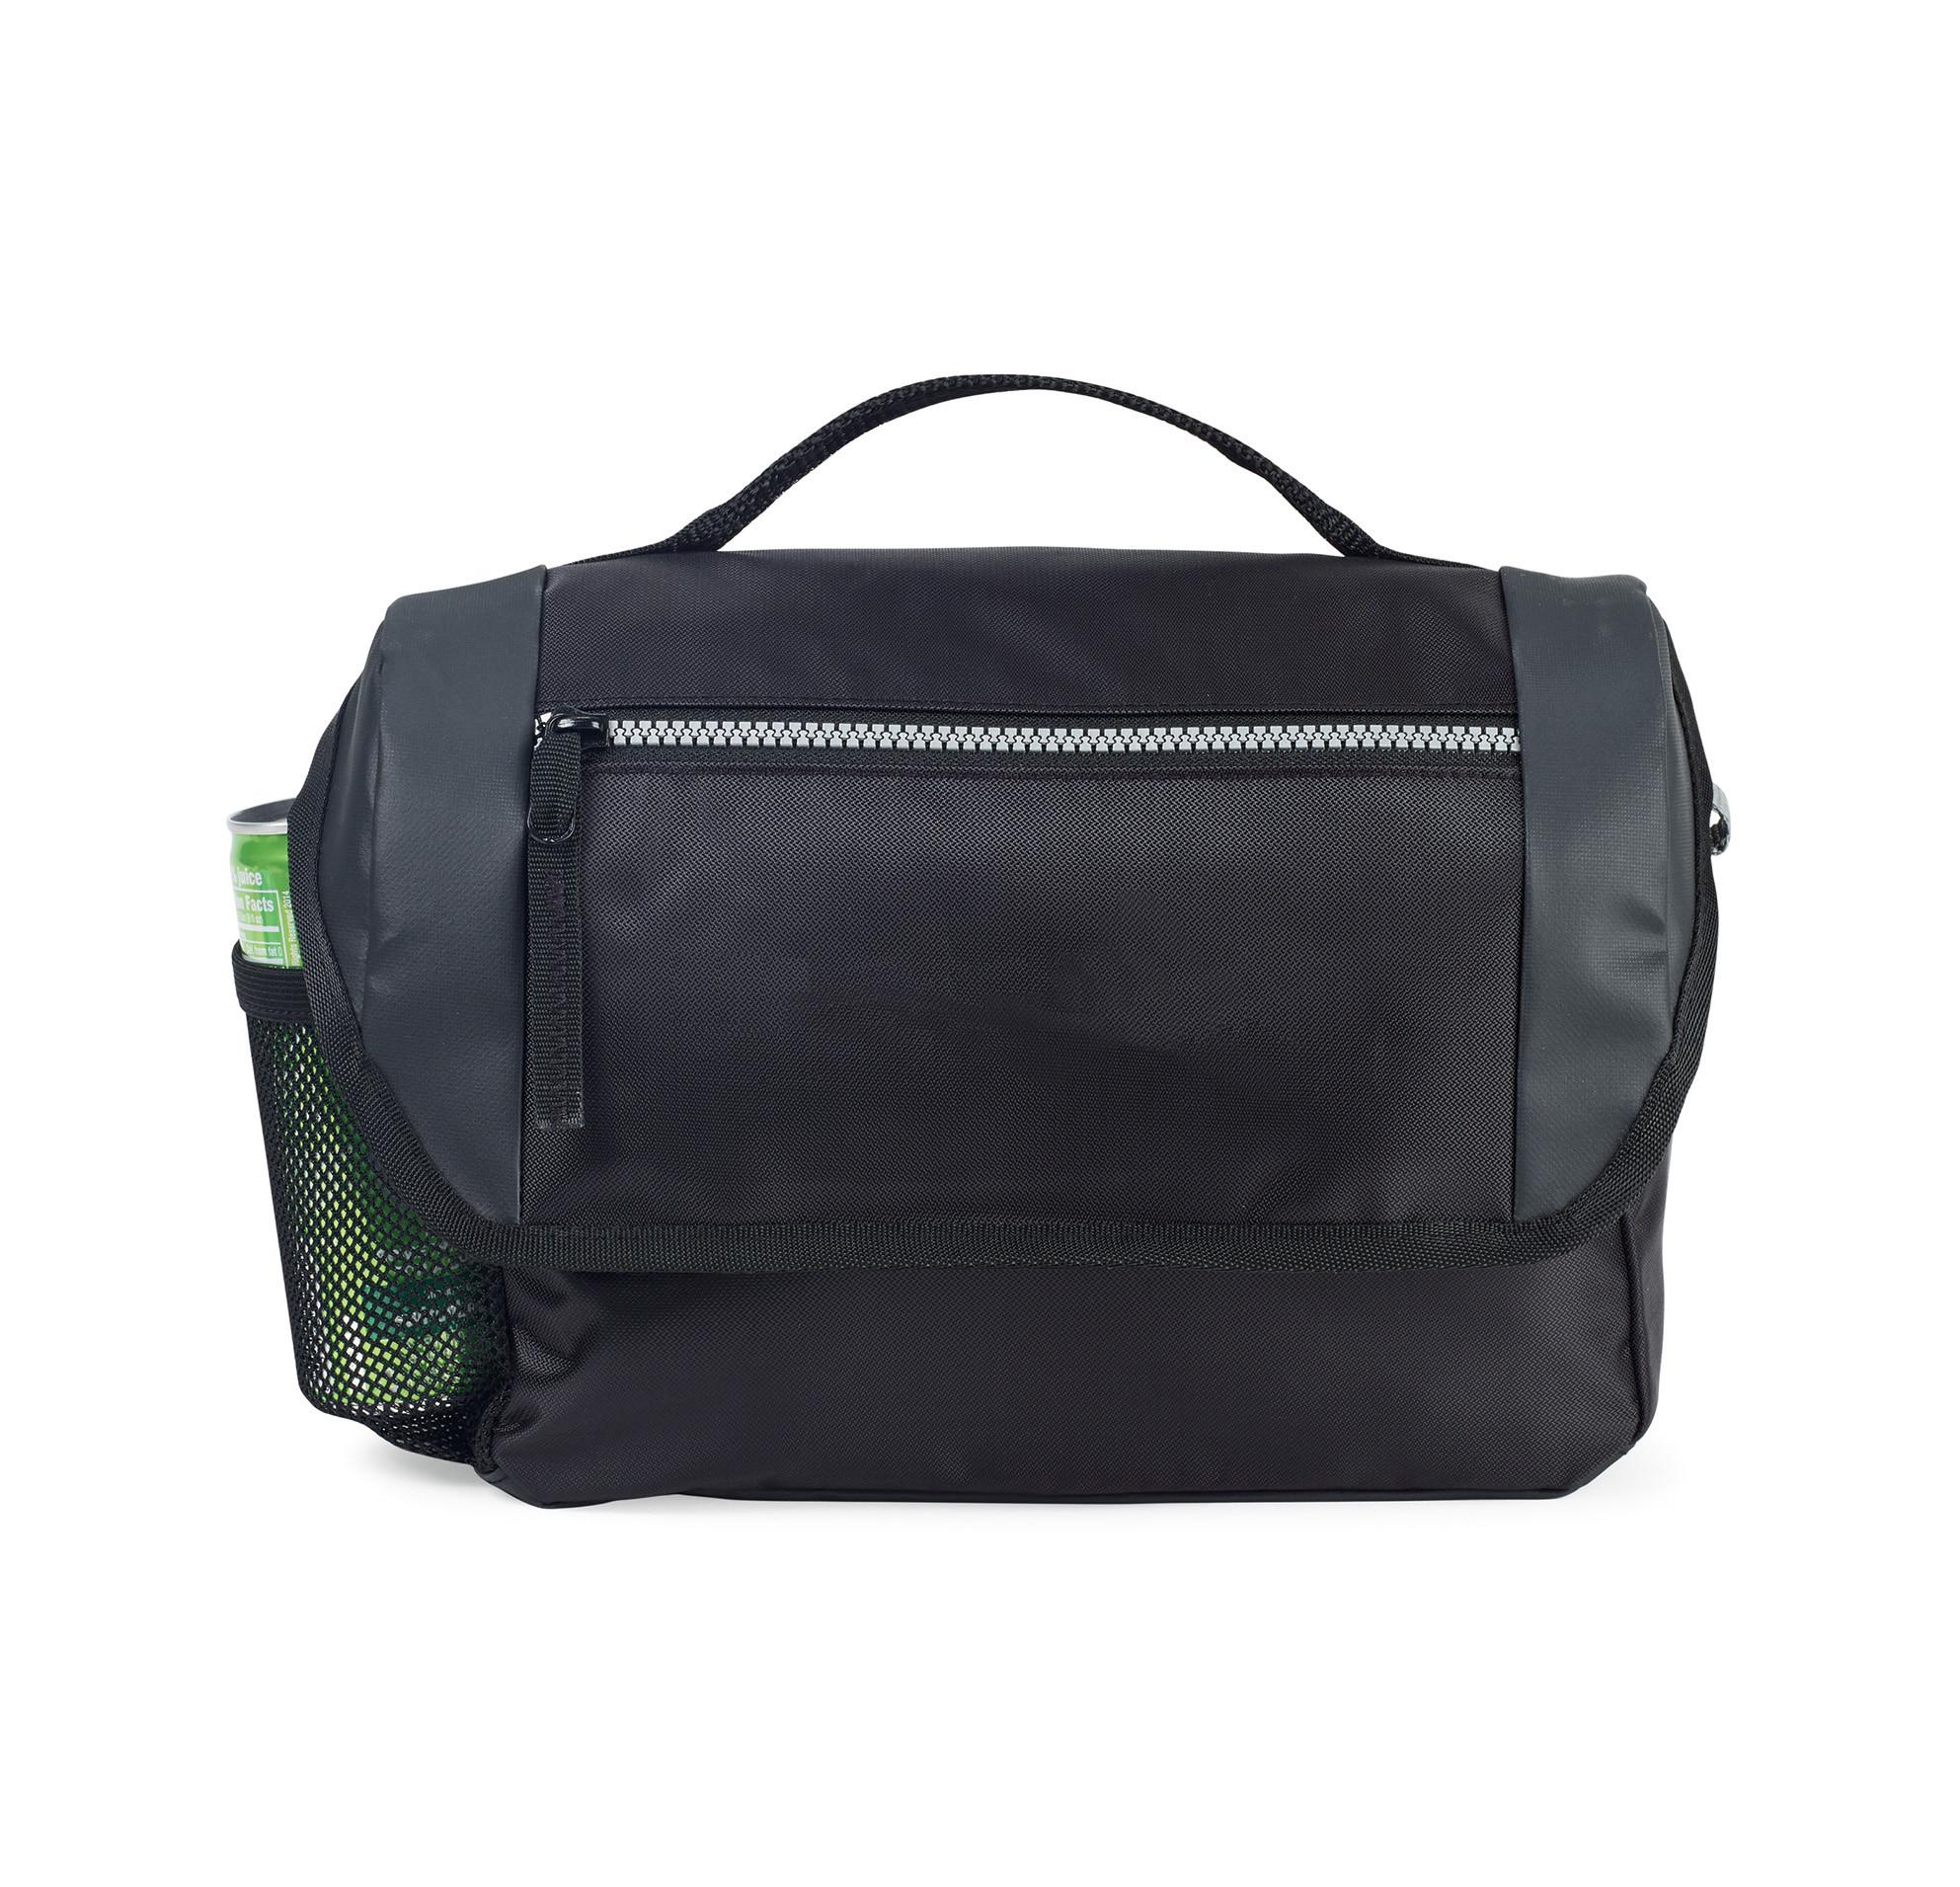 Gemline 2179 - Terra 4-in-1 Messenger Bag